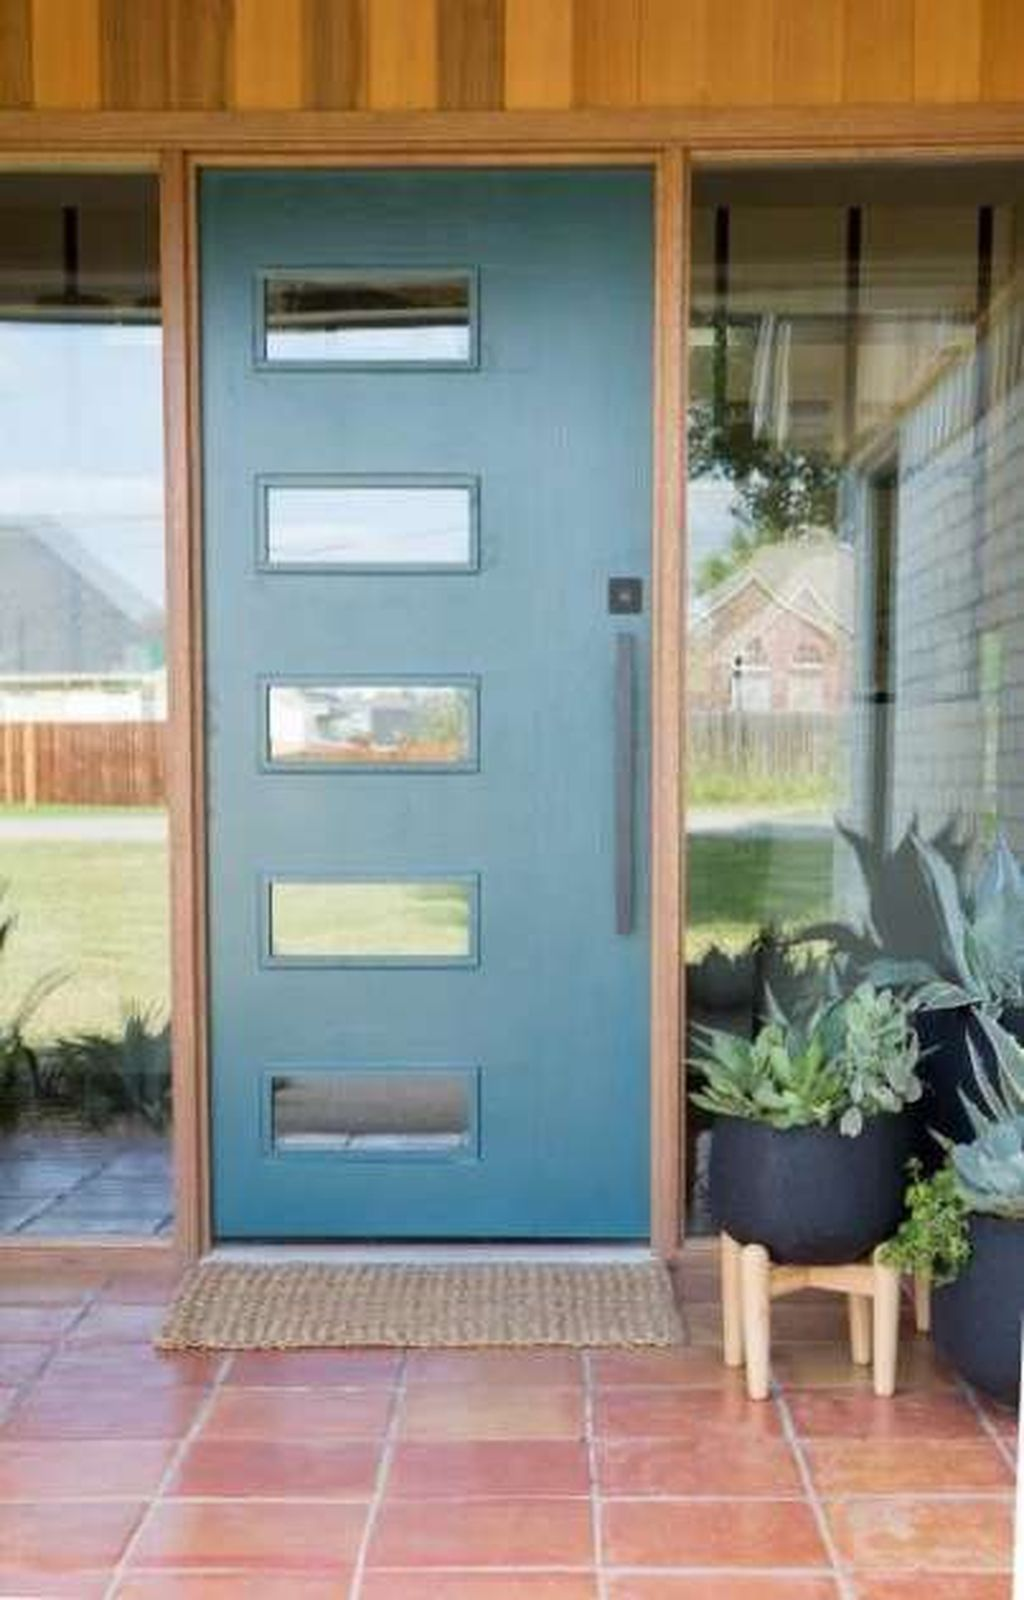 The Best Modern Front Entrance Exterior Design Ideas 23